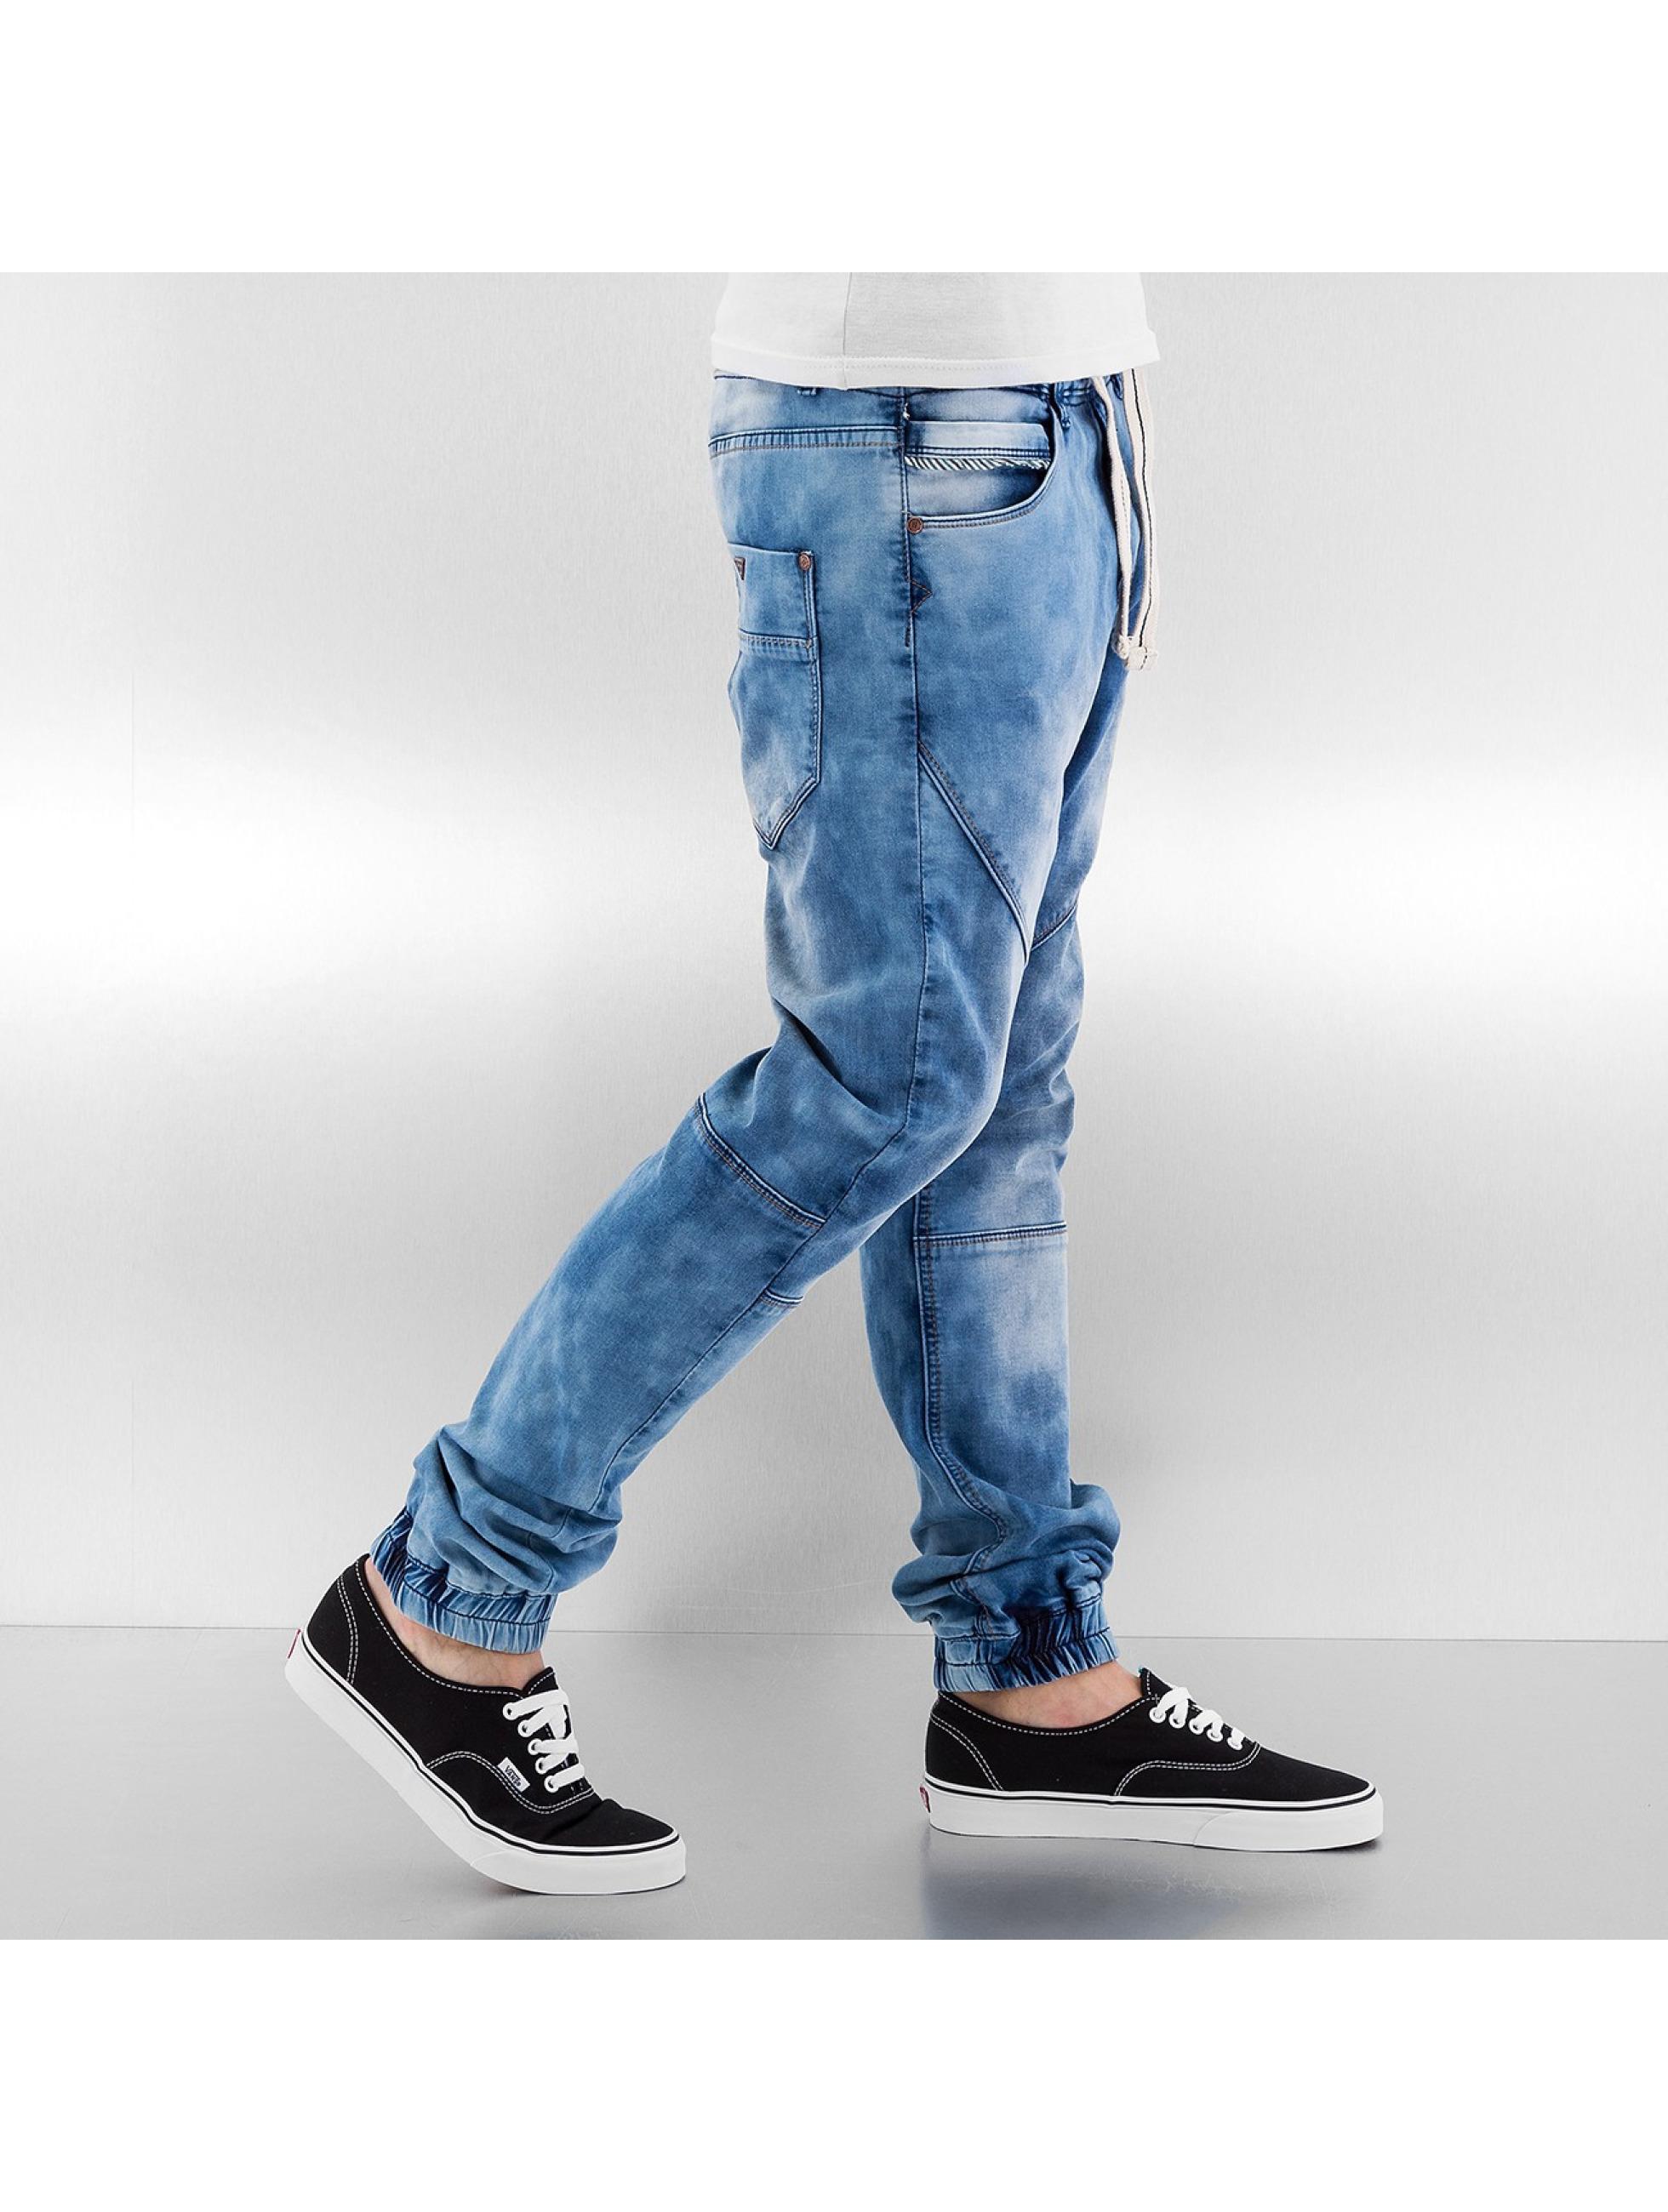 https://cdn.def-shop.com/original/sublevel-straight-fit-jeans-blau-143493__1.jpg